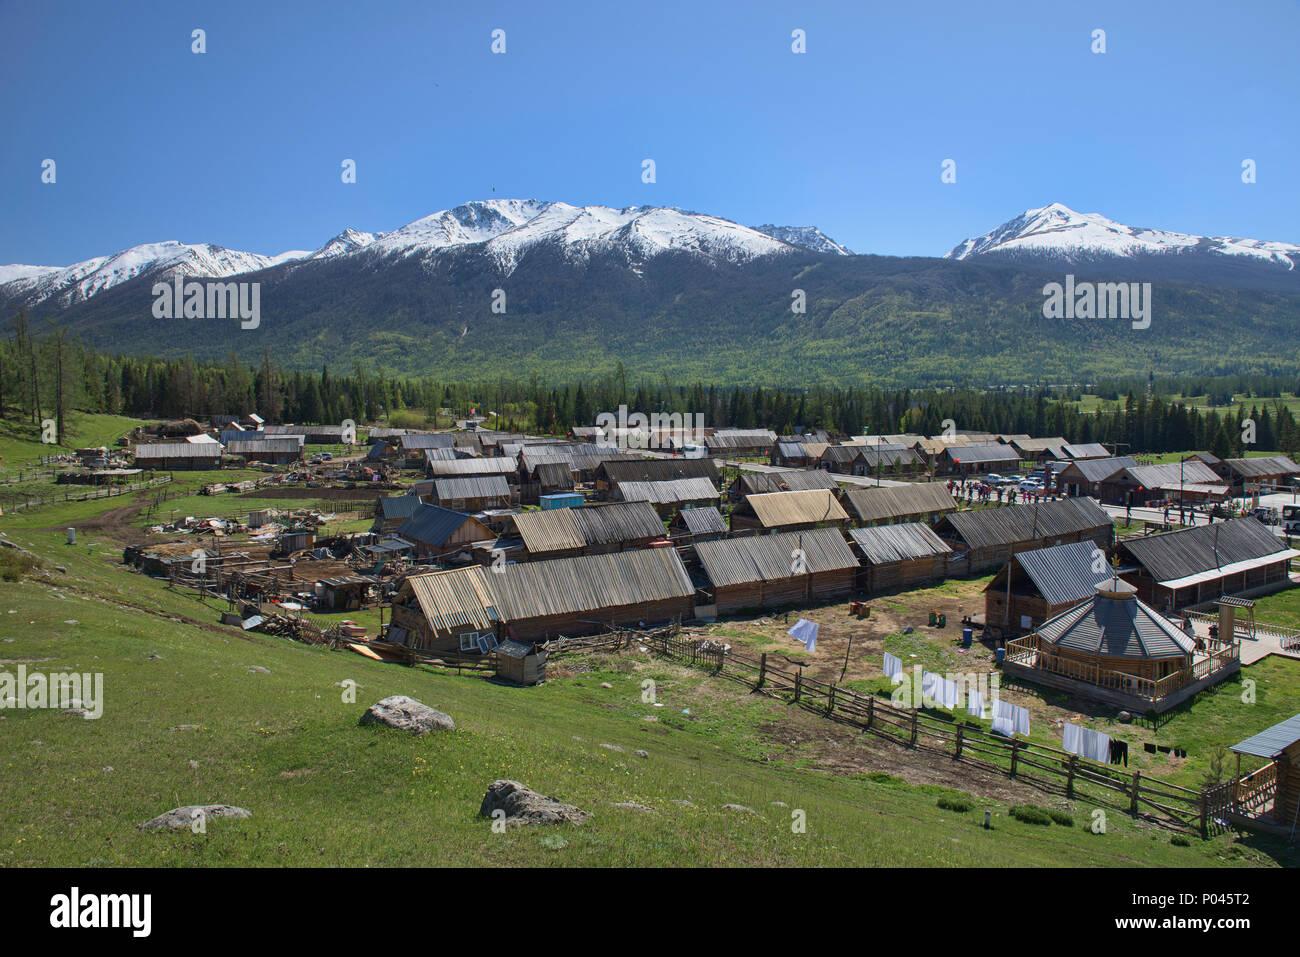 Tuvan village, Kanas Lake National Park, Xinjiang, China Stock Photo